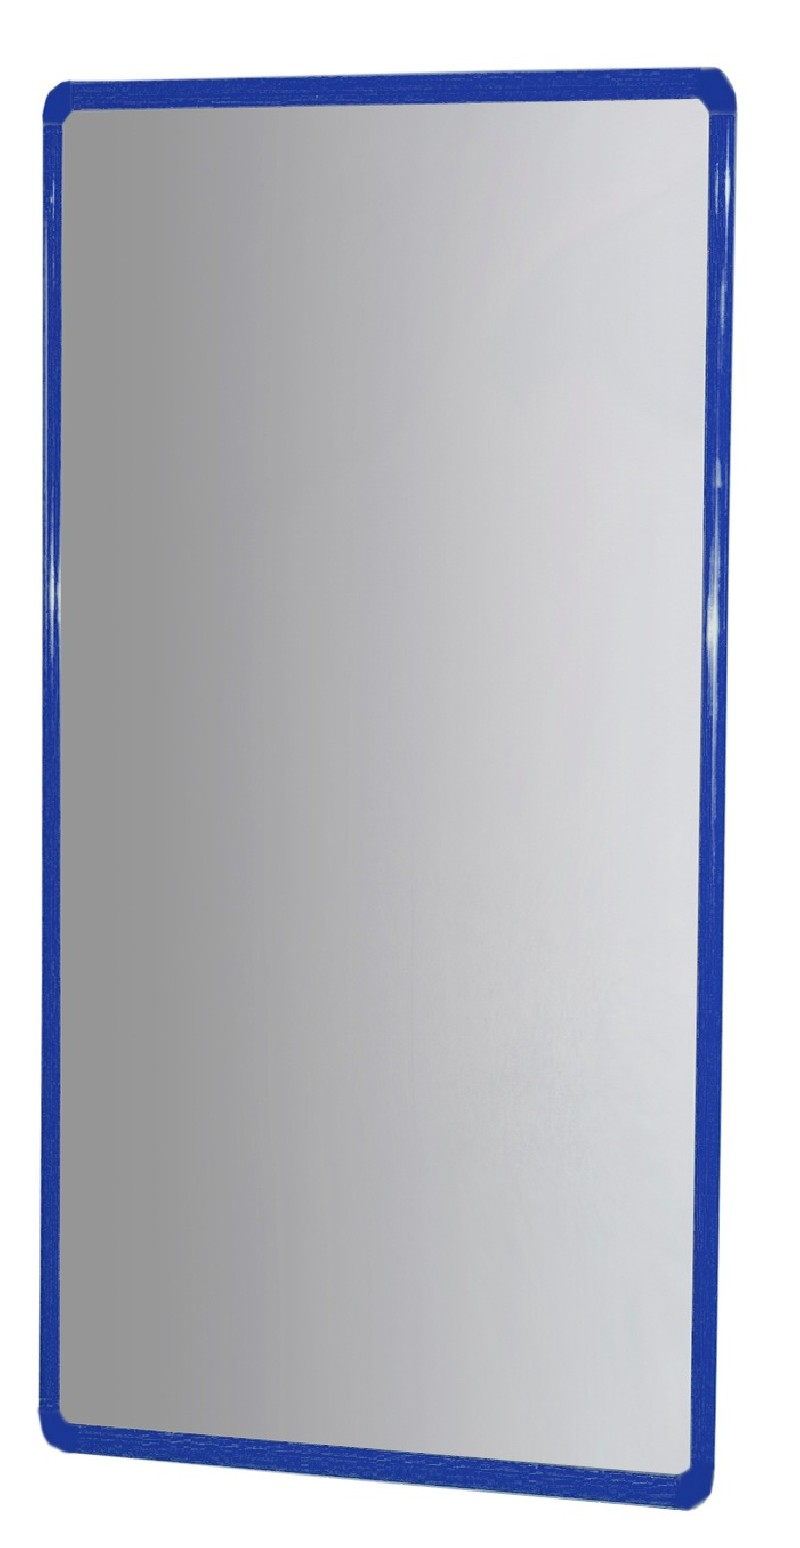 spiegel mit aluminiumrahmen 120x50cm snap edulink s l. Black Bedroom Furniture Sets. Home Design Ideas